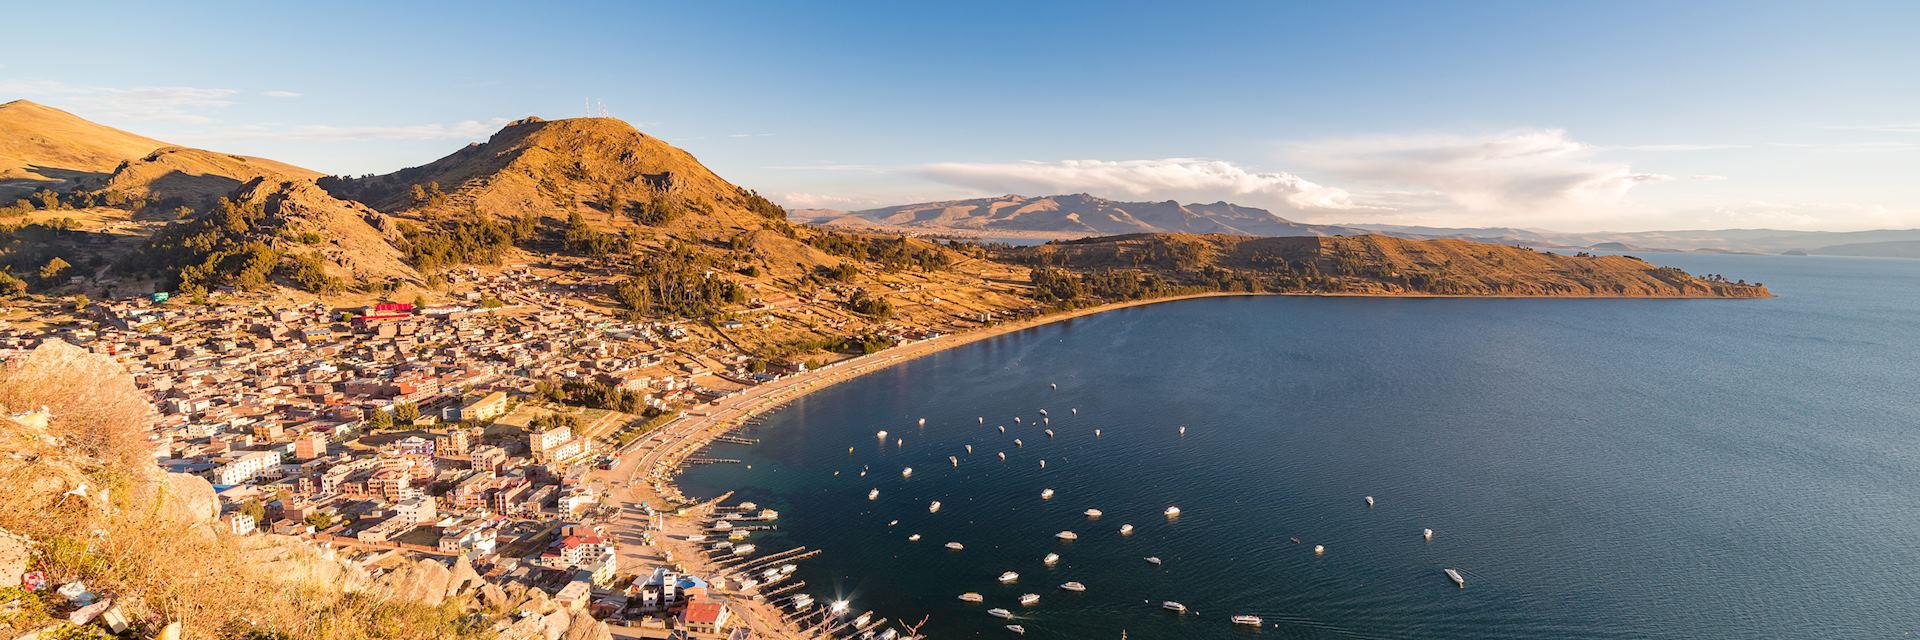 Sun Island, Lake Titicaca